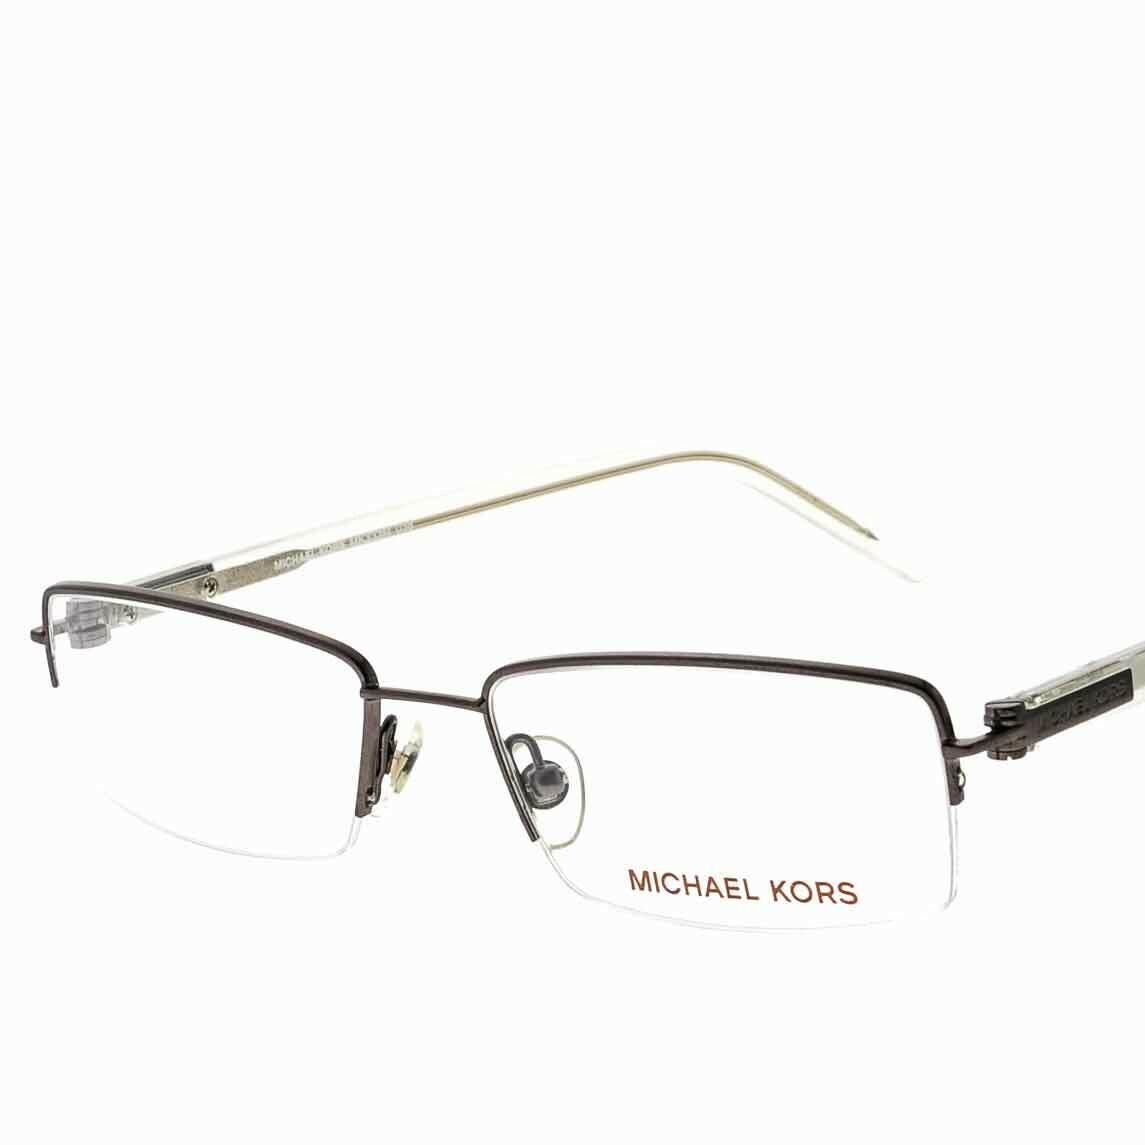 MICHAEL KORS MK333M